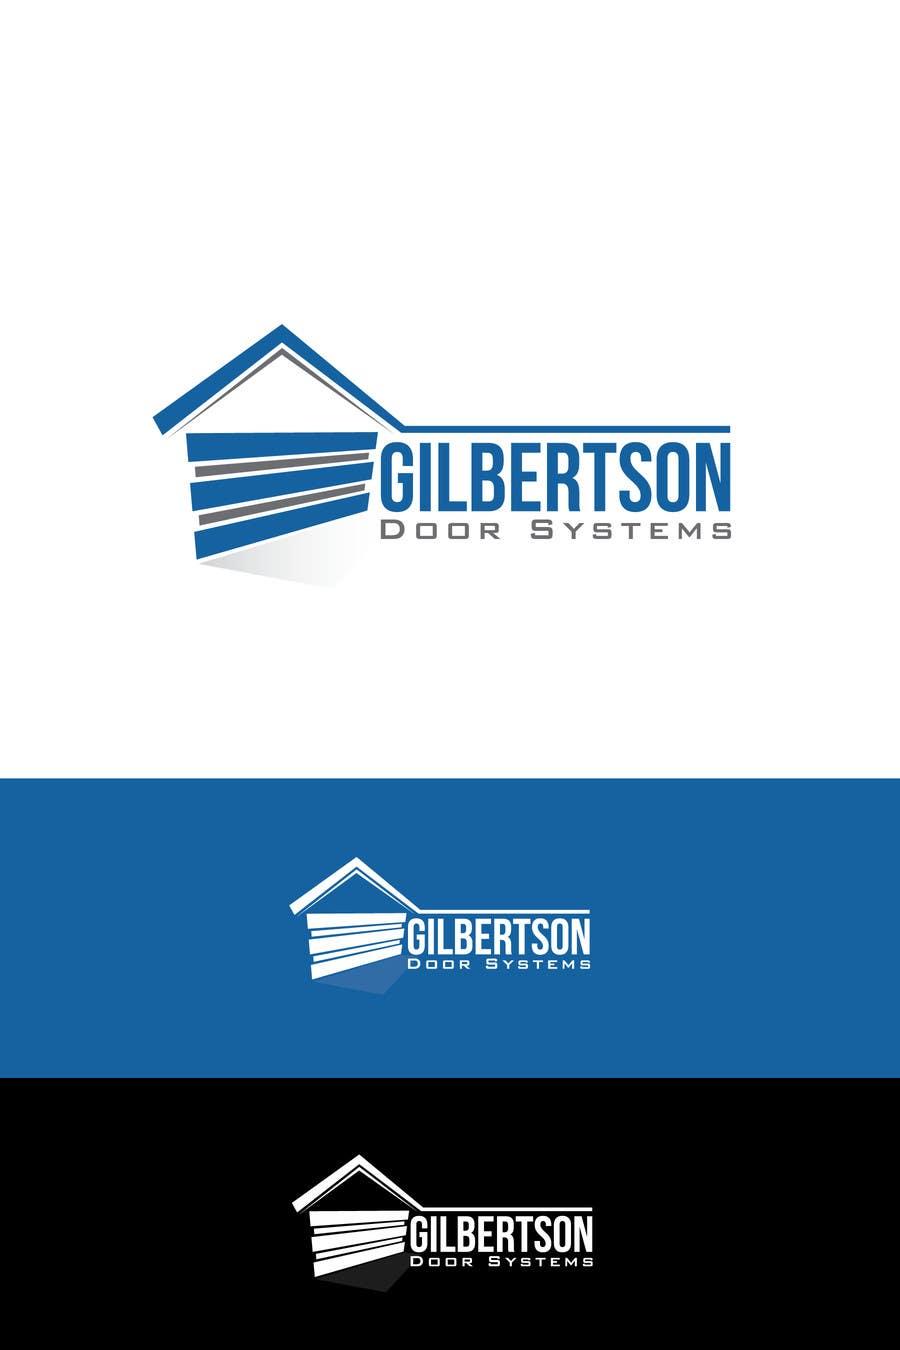 Kilpailutyö #7 kilpailussa Design a Logo for Gilbertson Door Systems